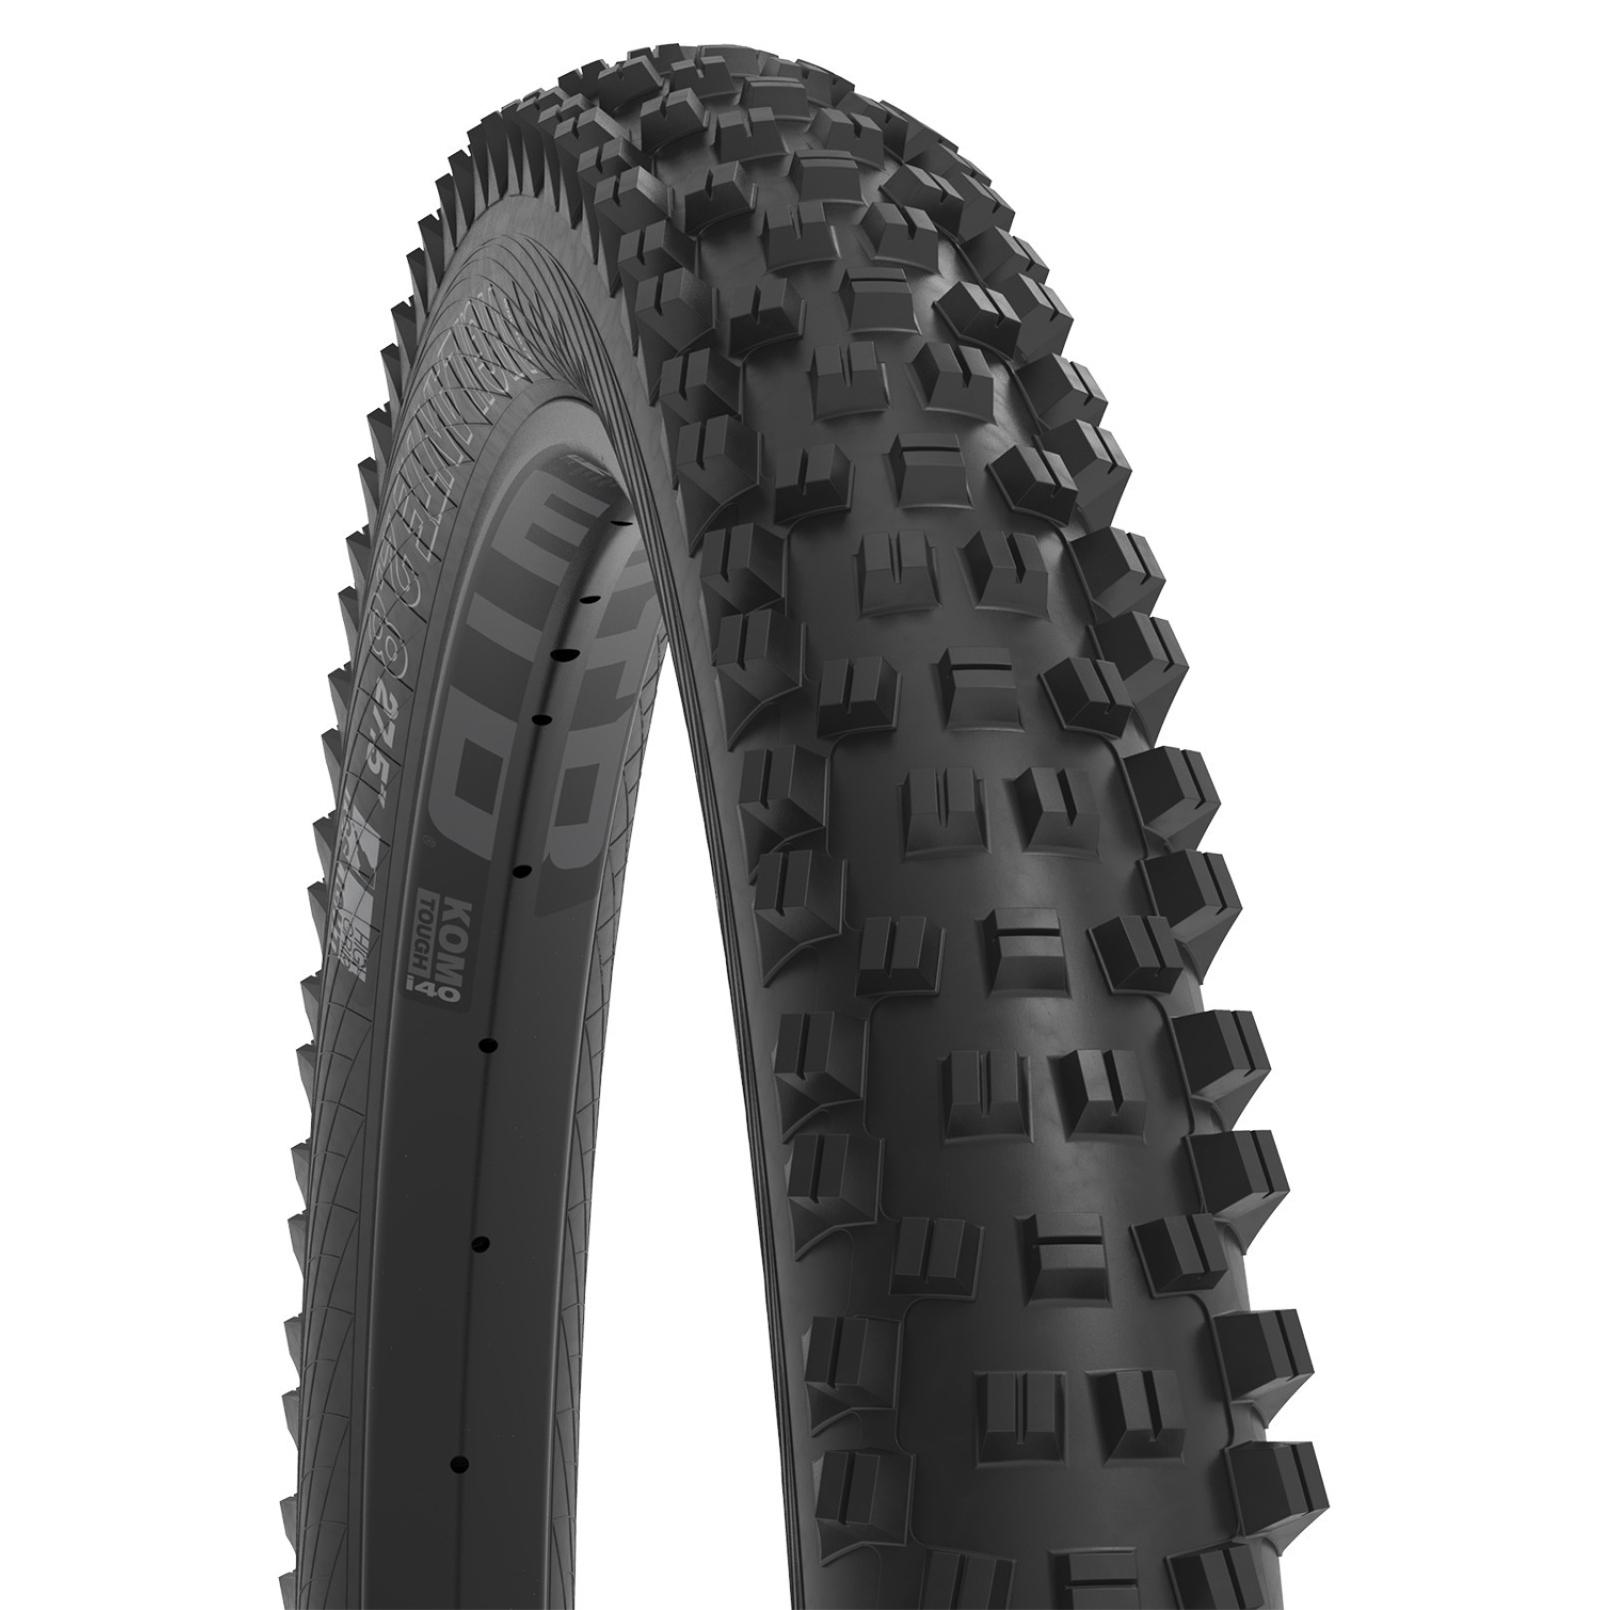 WTB Vigilante 2.8 TCS Tough/Fast Rolling MTB Folding Tire - 29x2.8 Inches - black